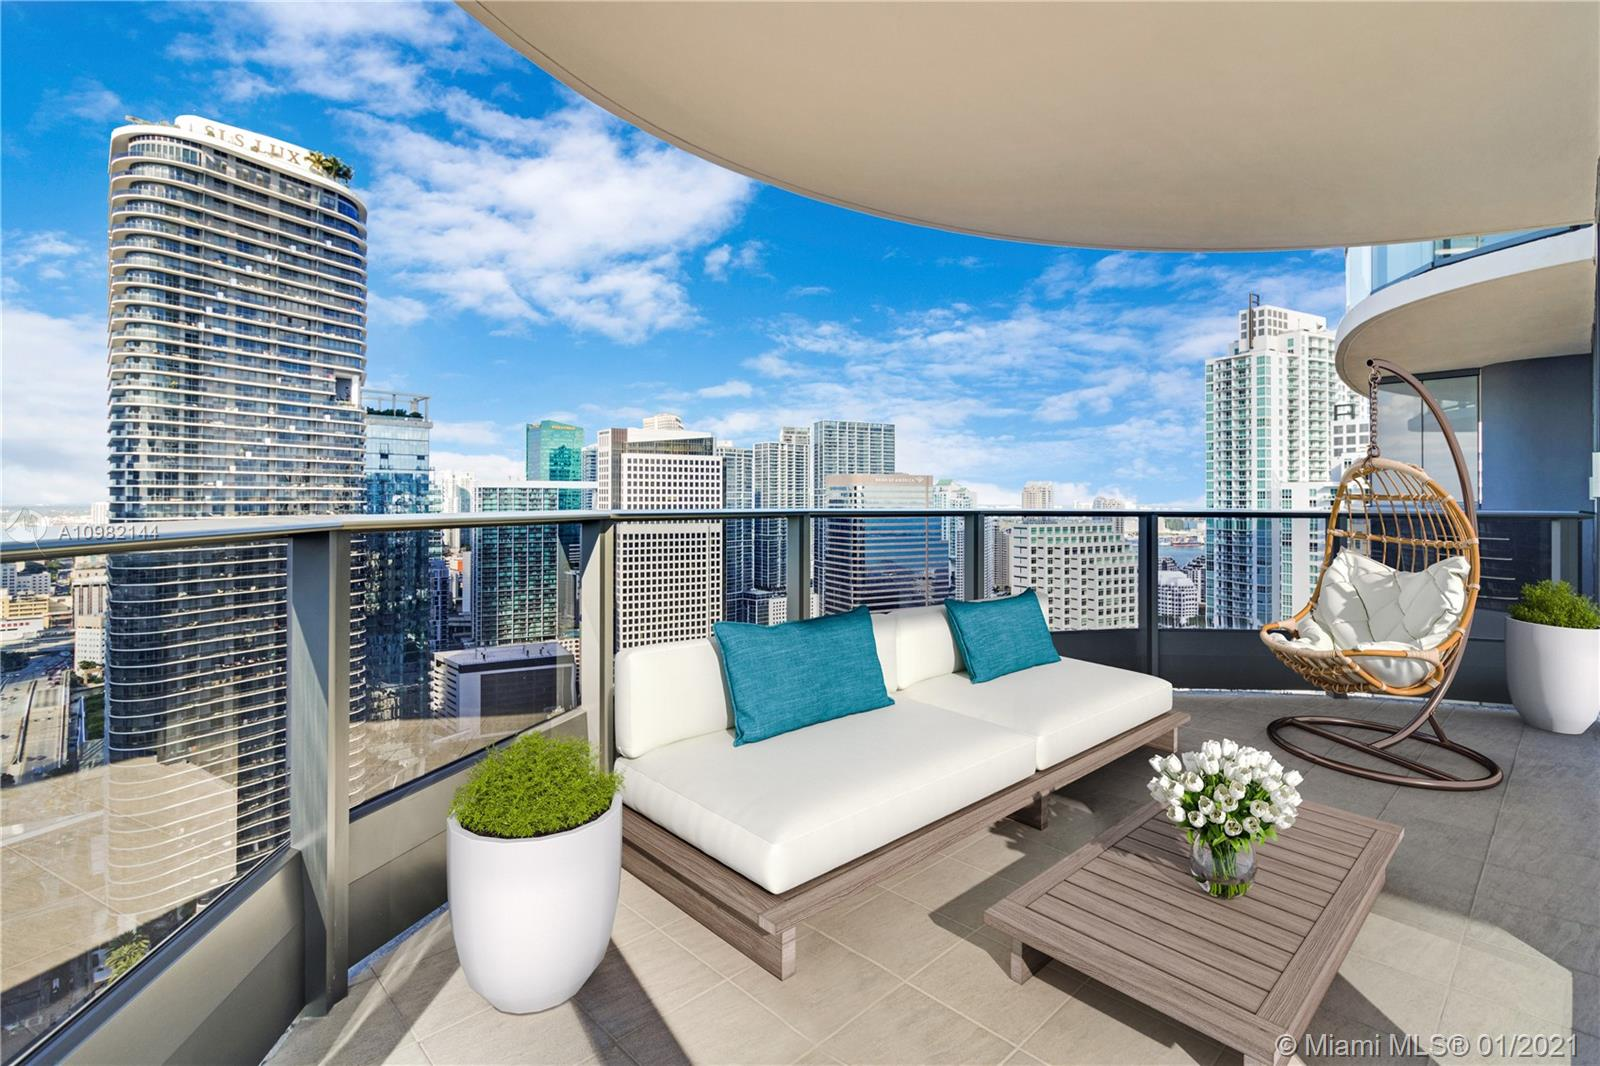 Brickell FlatIron #4012 - 1000 BRICKELL PLAZA #4012, Miami, FL 33131